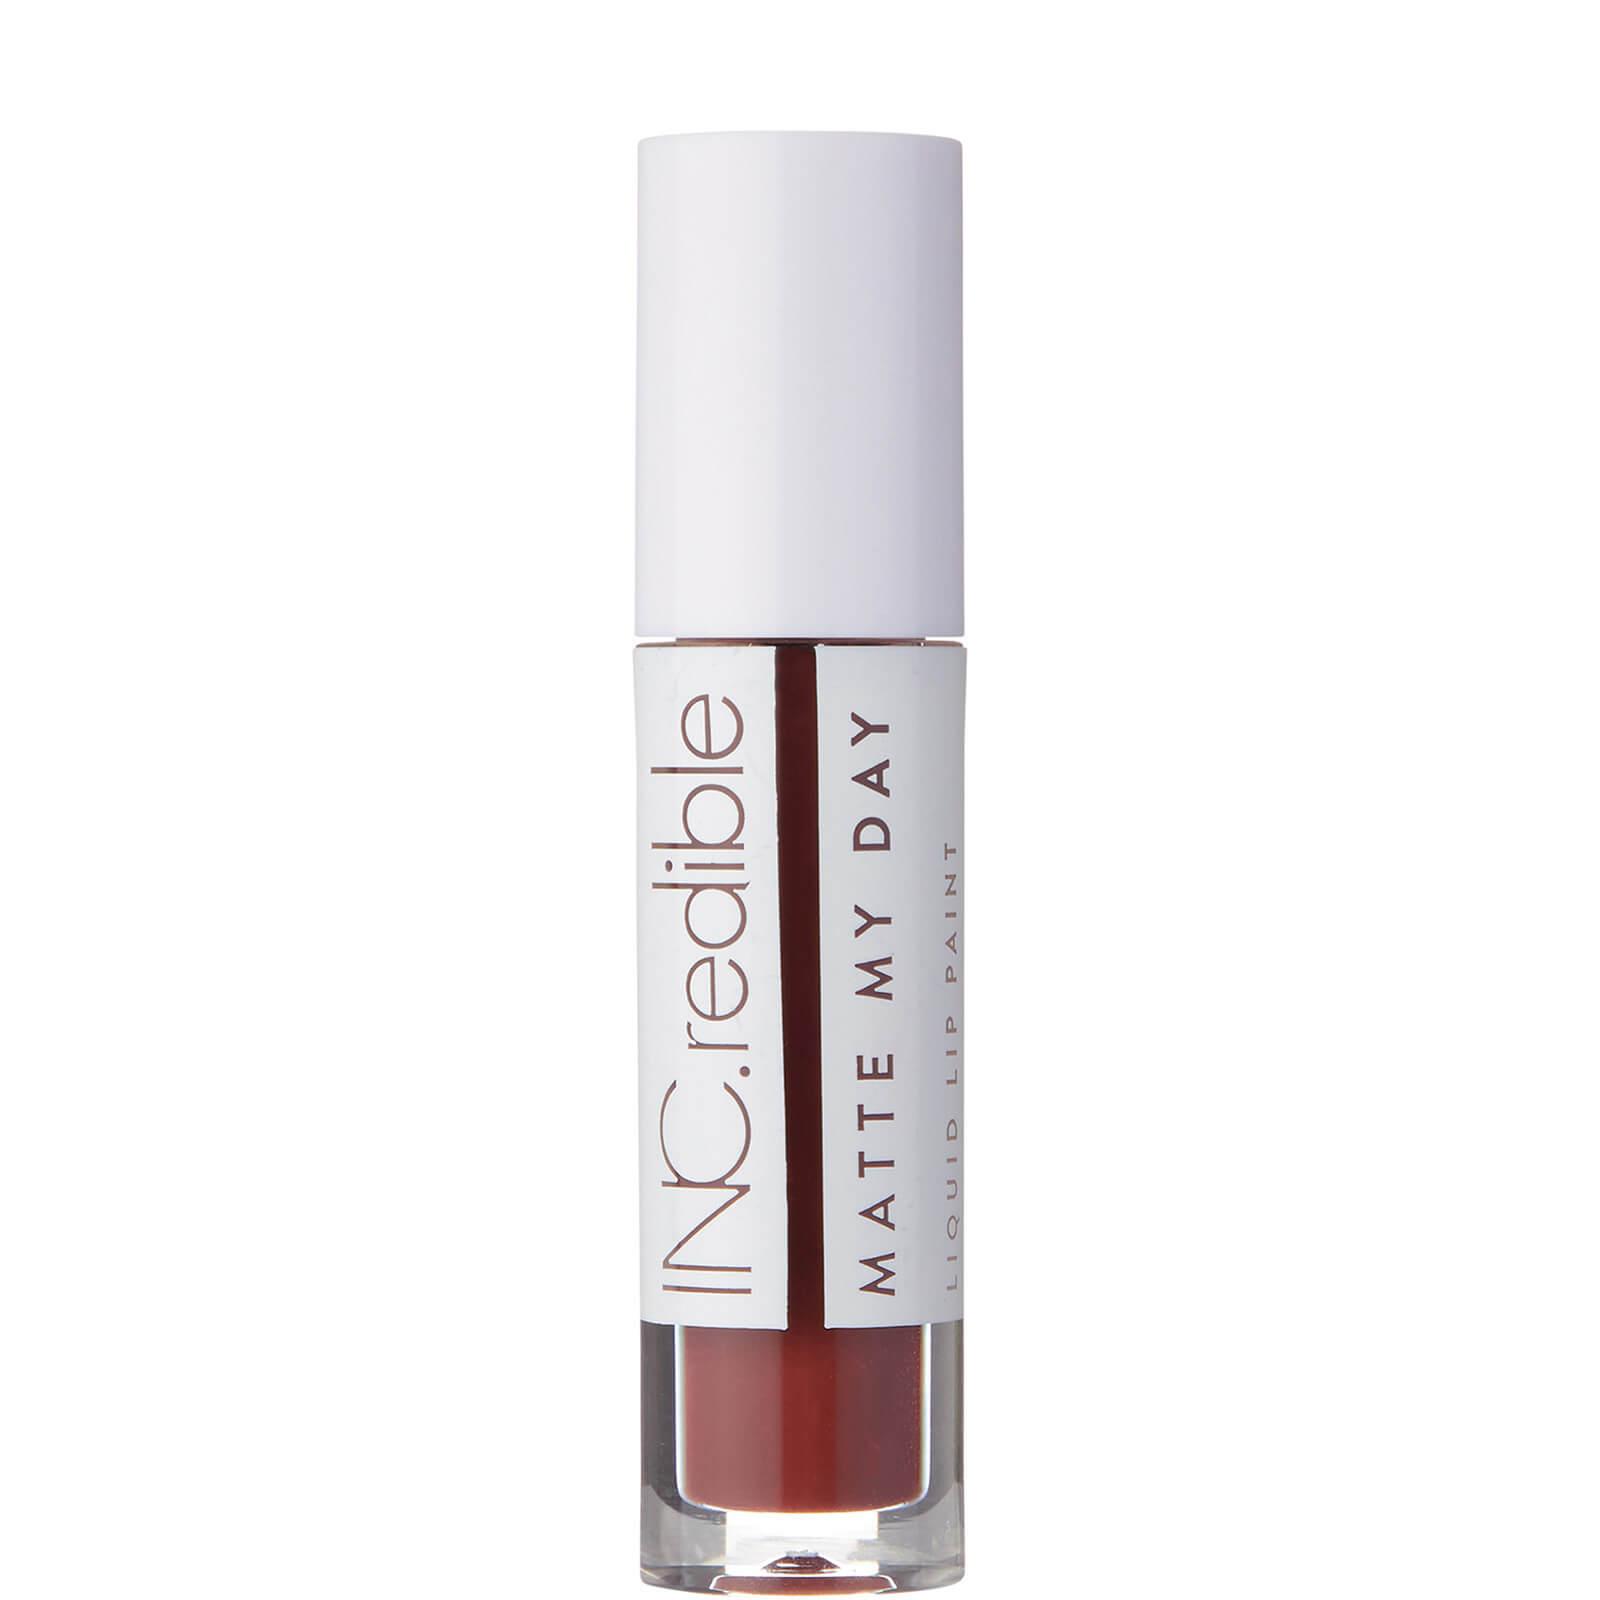 INC.redible Matte My Day rossetto liquido (varie tonalità) - Female AF